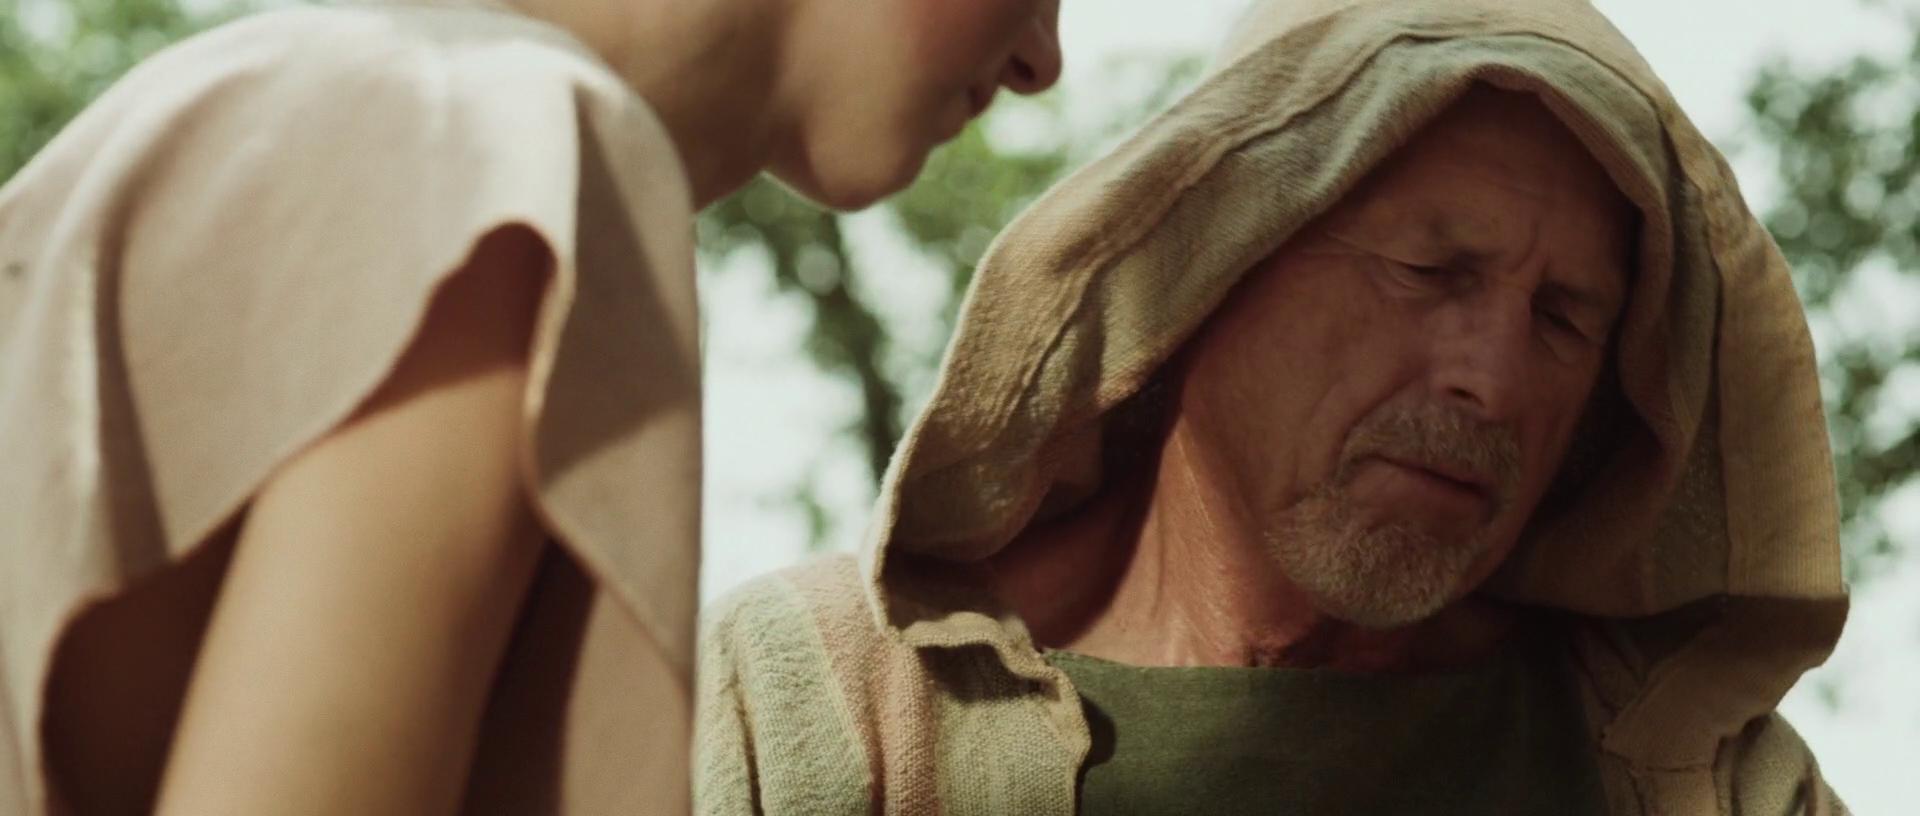 Al Lado de Cristo (2020) 1080p WEB-DL Latino